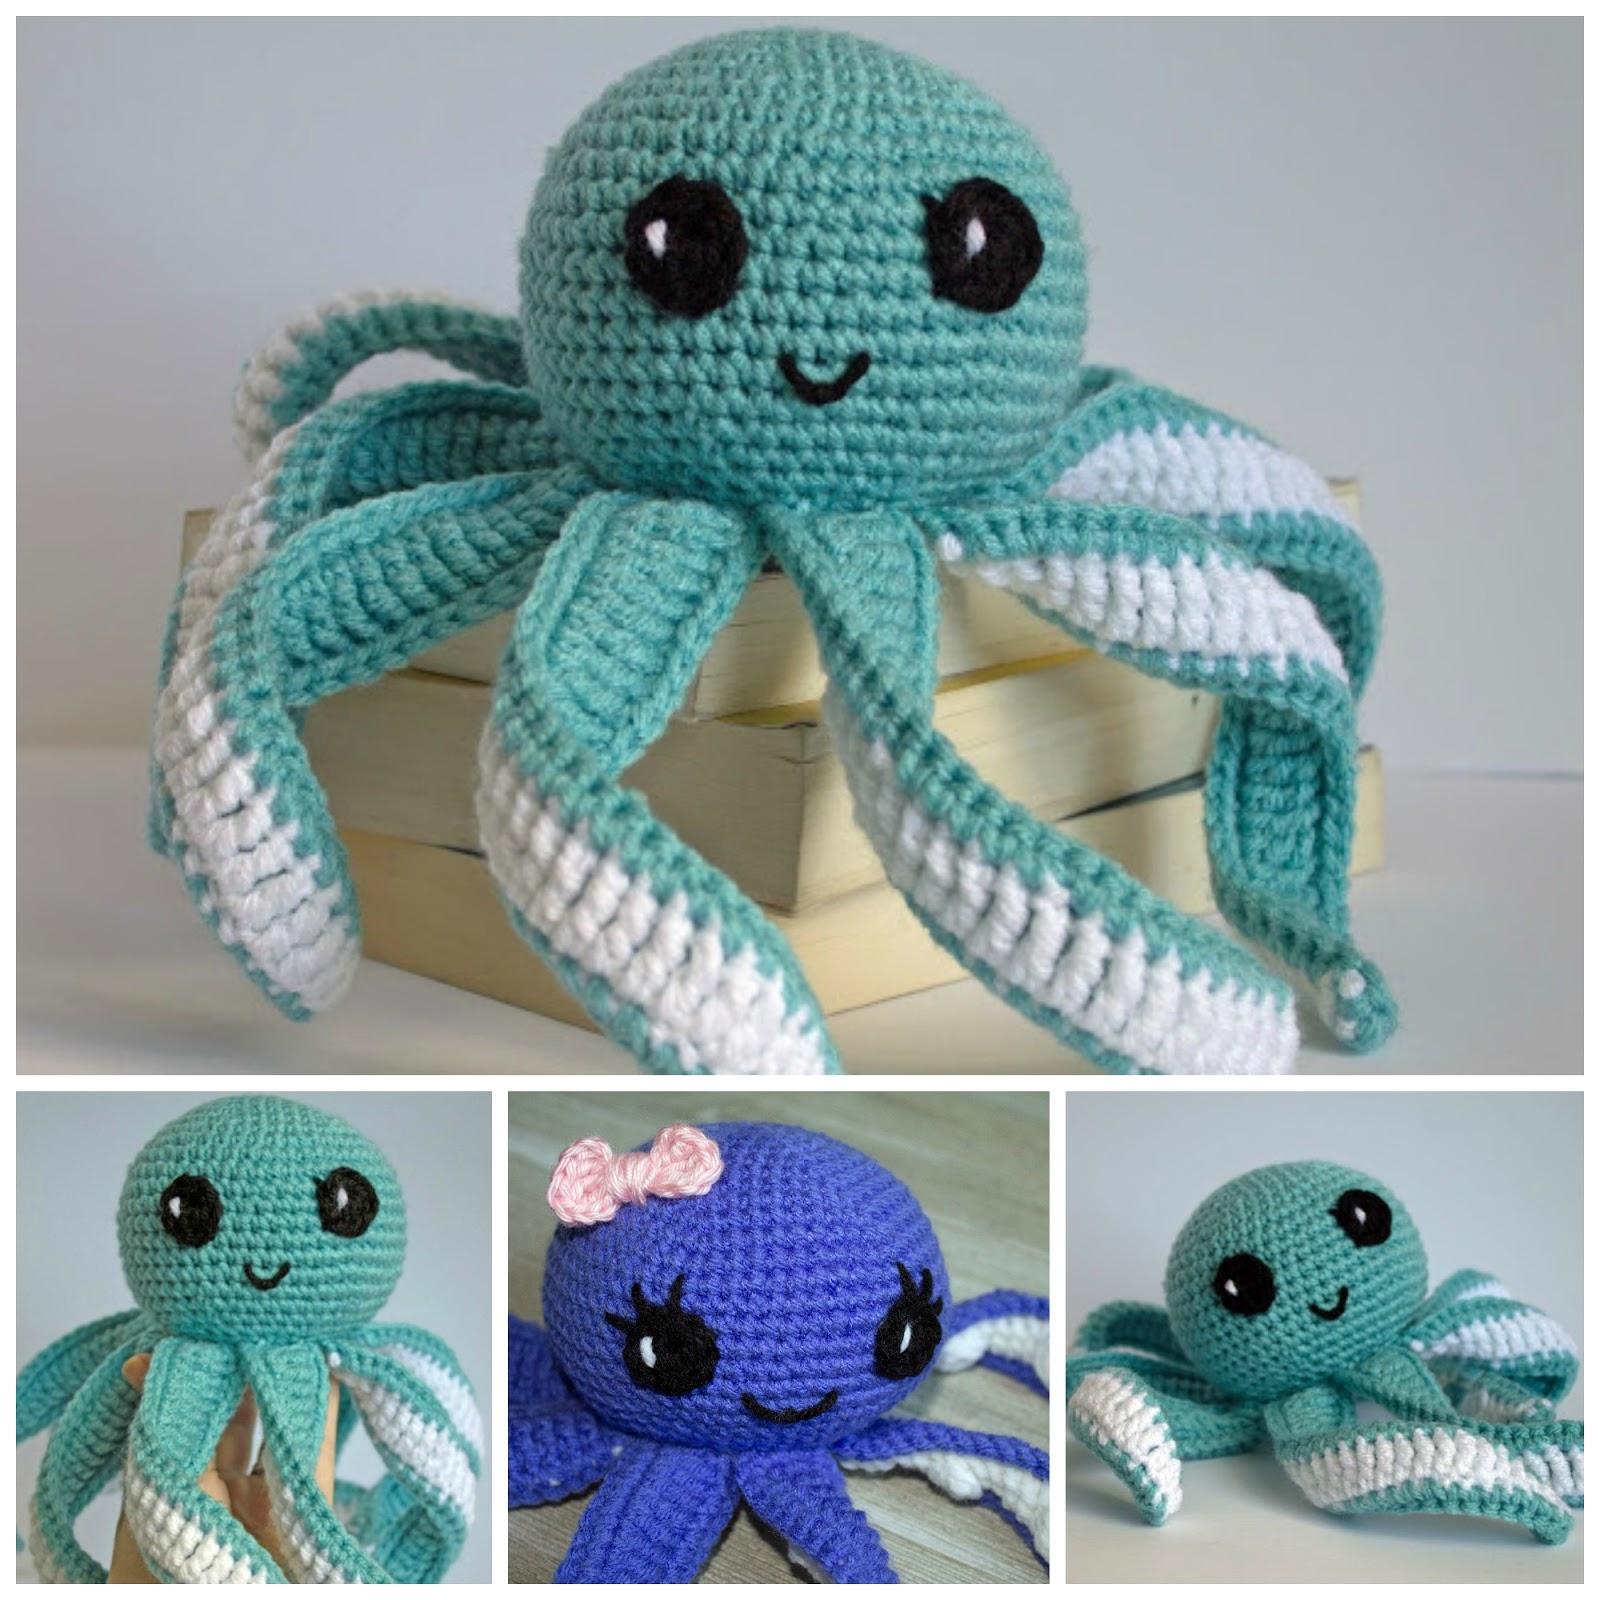 Amigurumi octopus | Free amigurumi and crochet patterns | lilleliis | 1600x1600